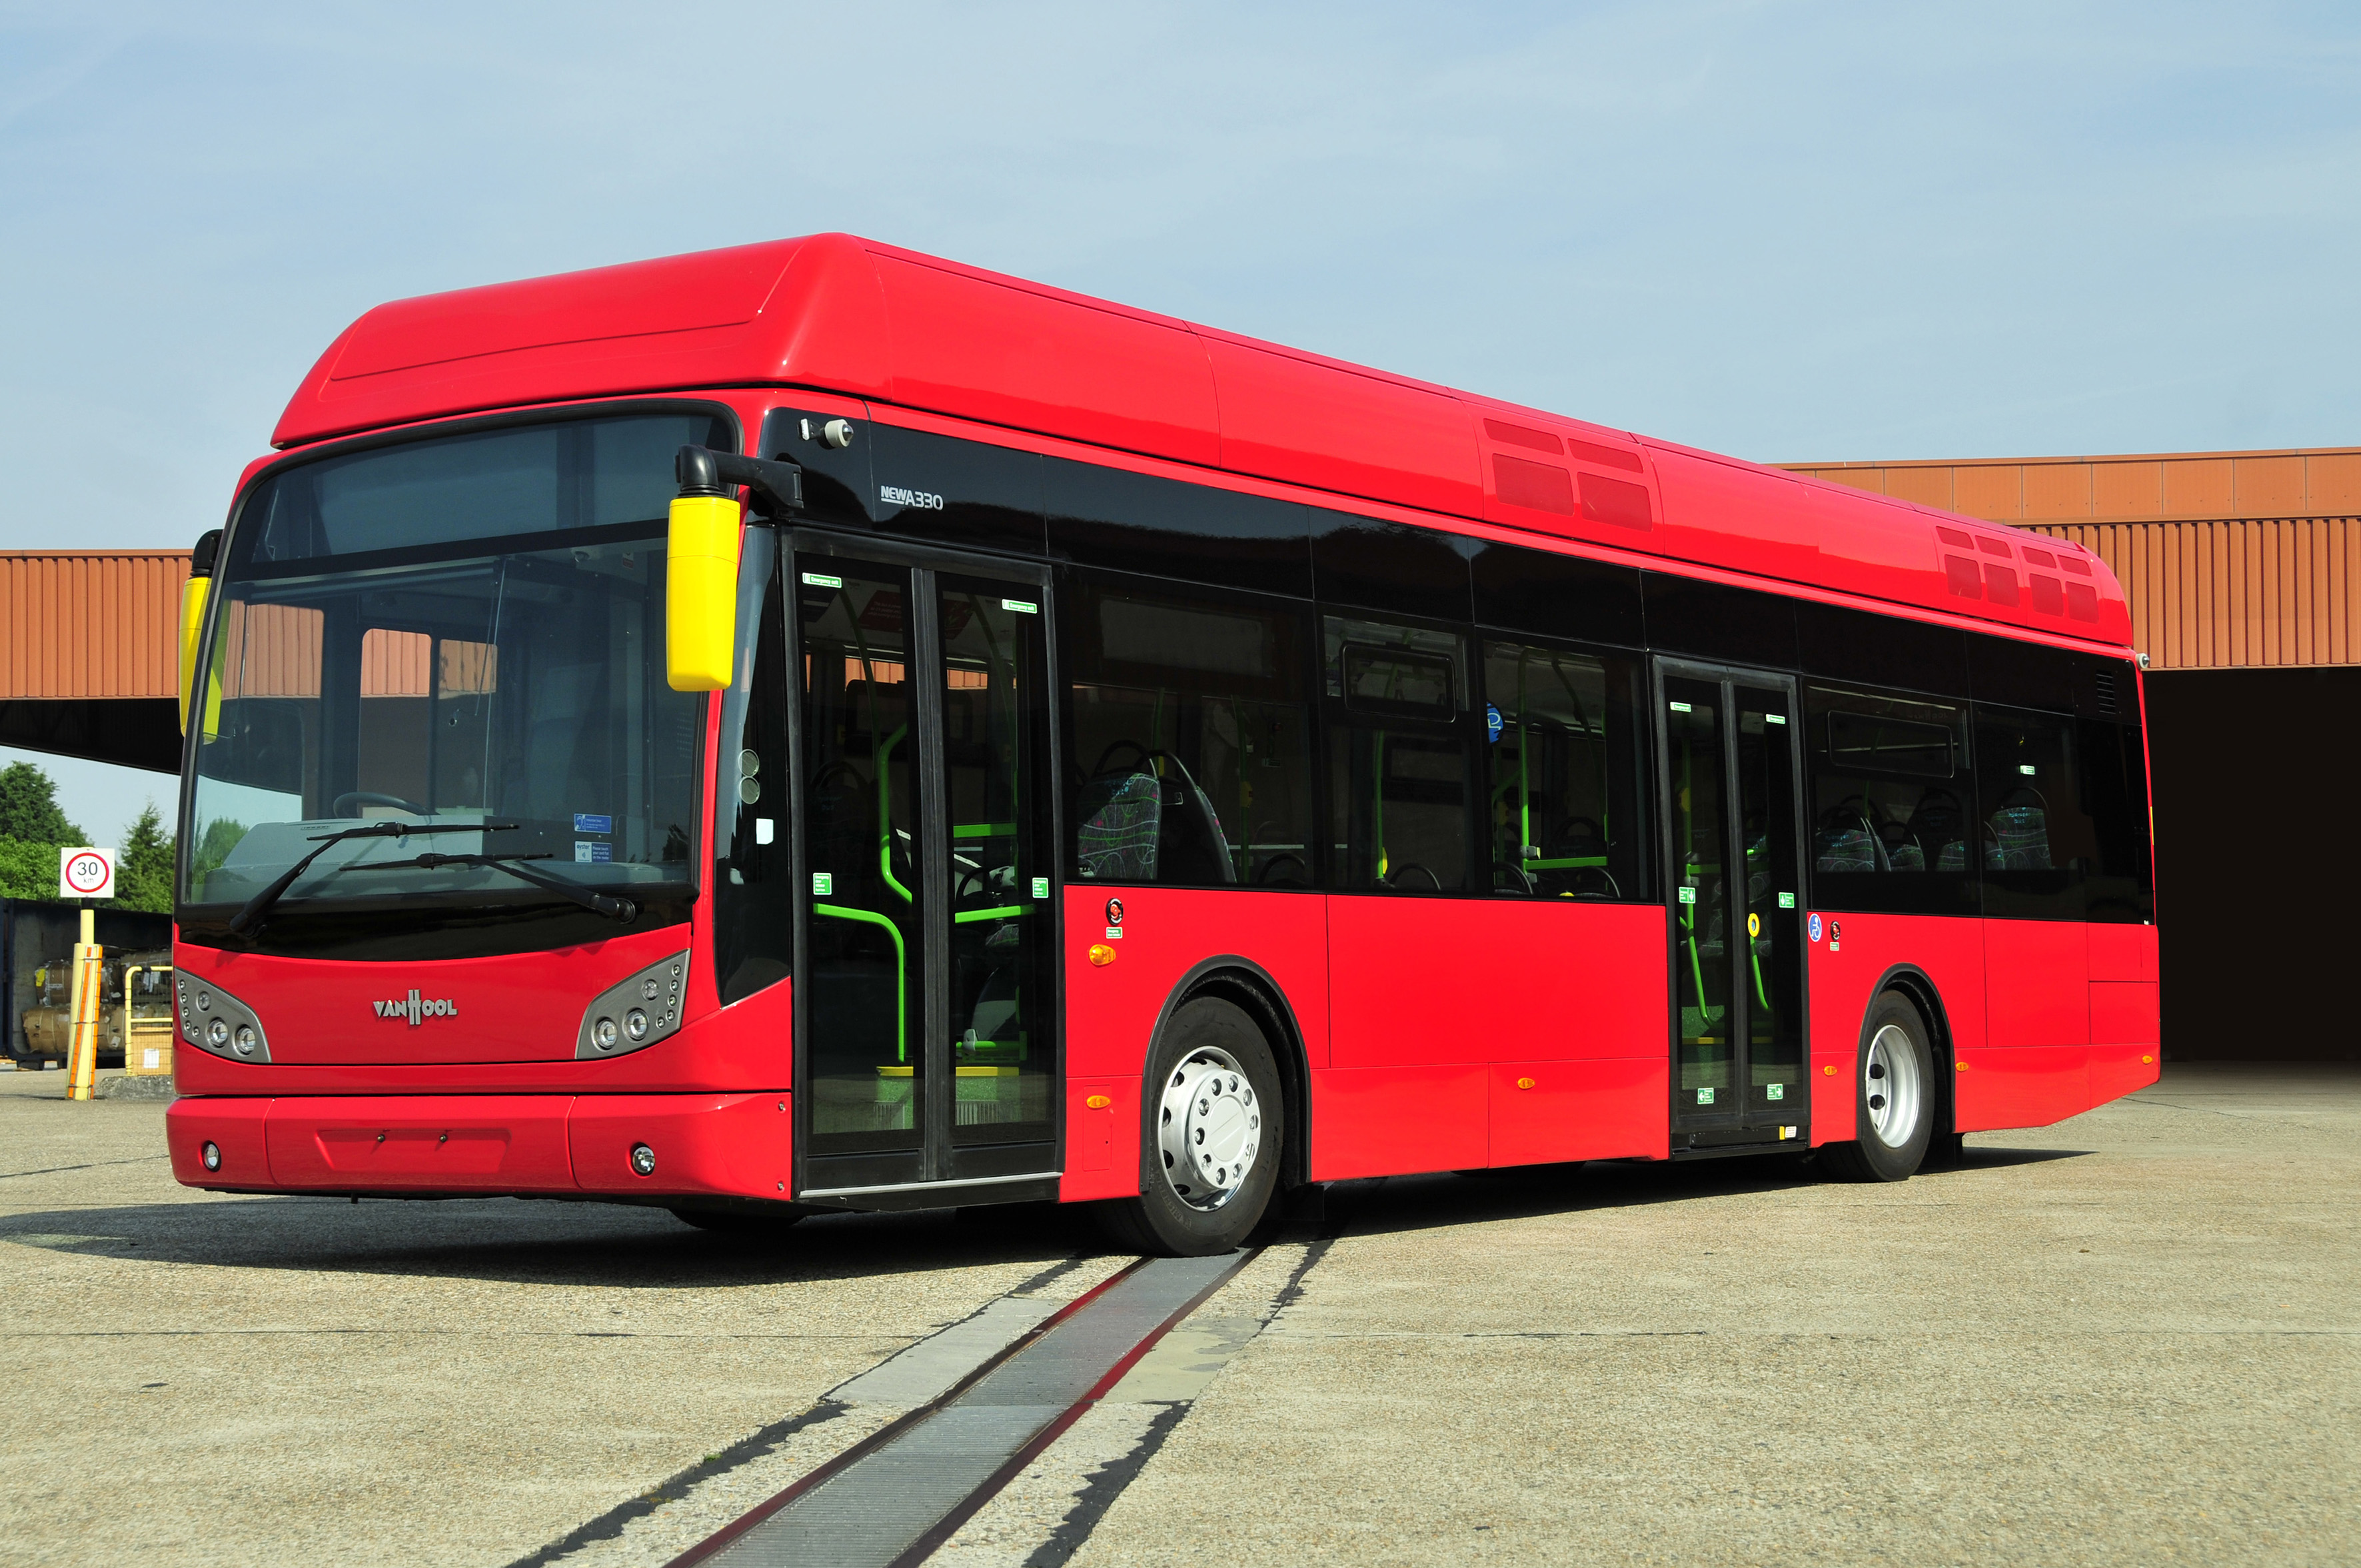 van hool to build 40 hydrogen buses for cologne and. Black Bedroom Furniture Sets. Home Design Ideas